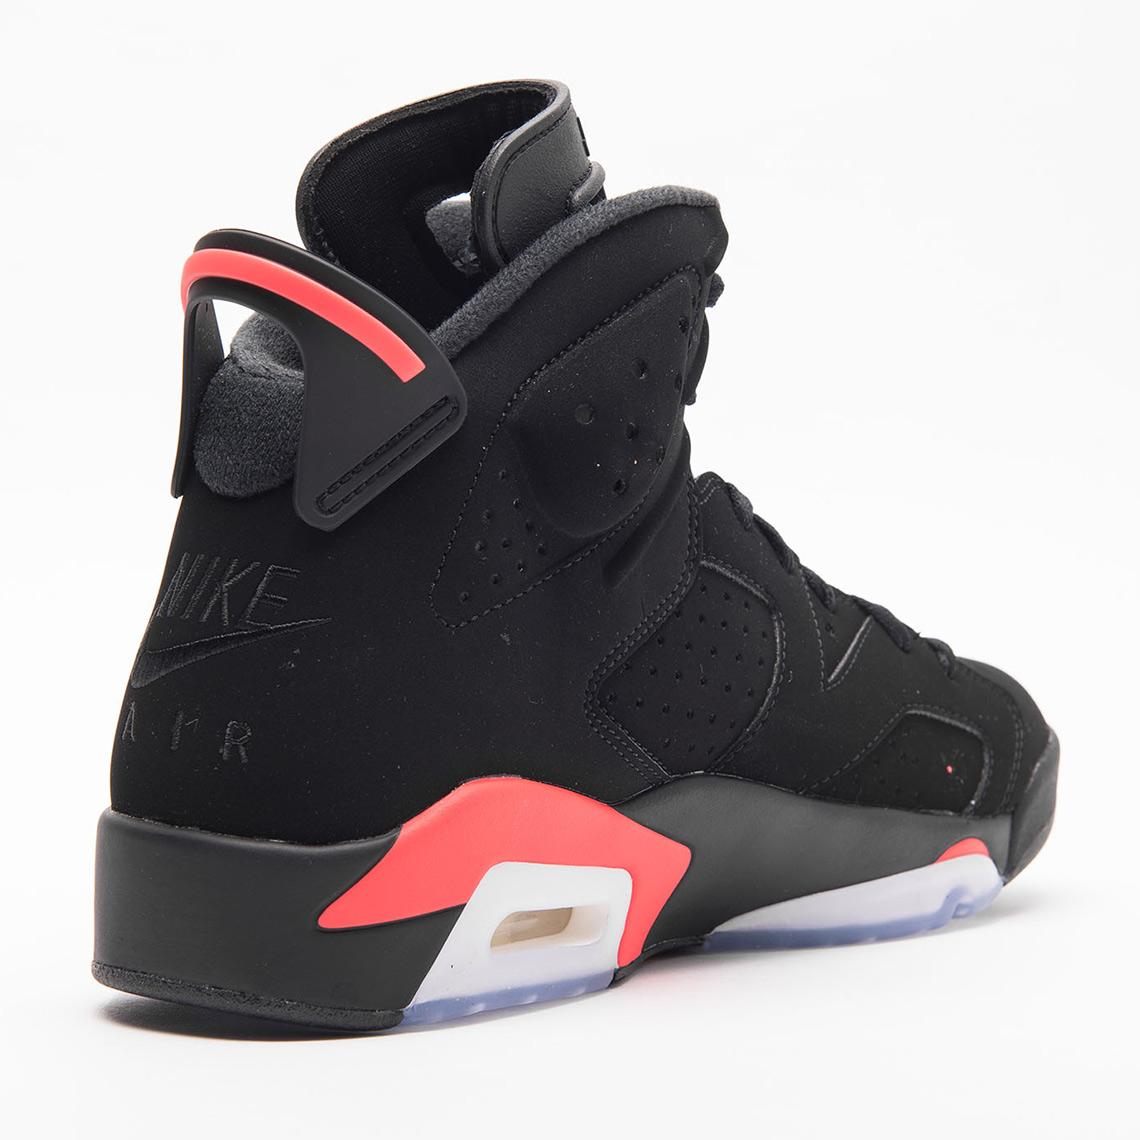 official photos 29231 dc7c0 Air Jordan 6 Retro Black Infrared 384664-060 Release Date ...